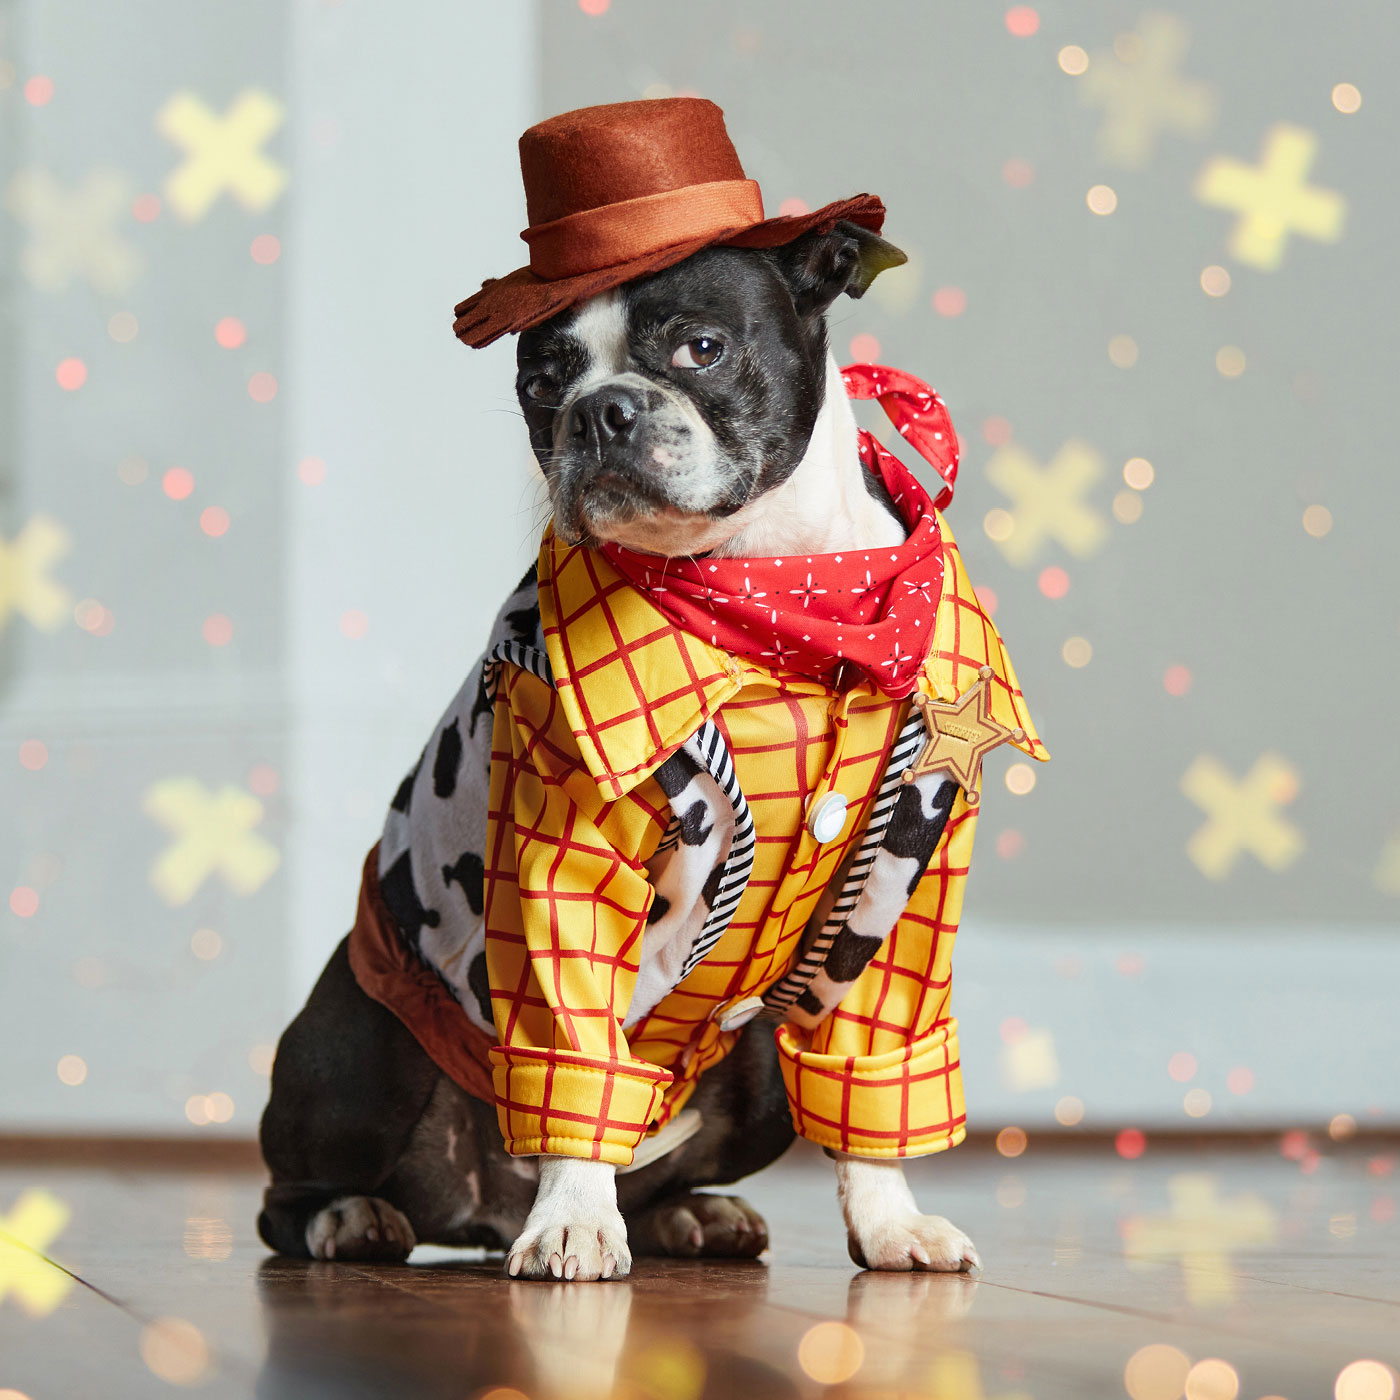 disney dog costume - woody dog costume from toy story